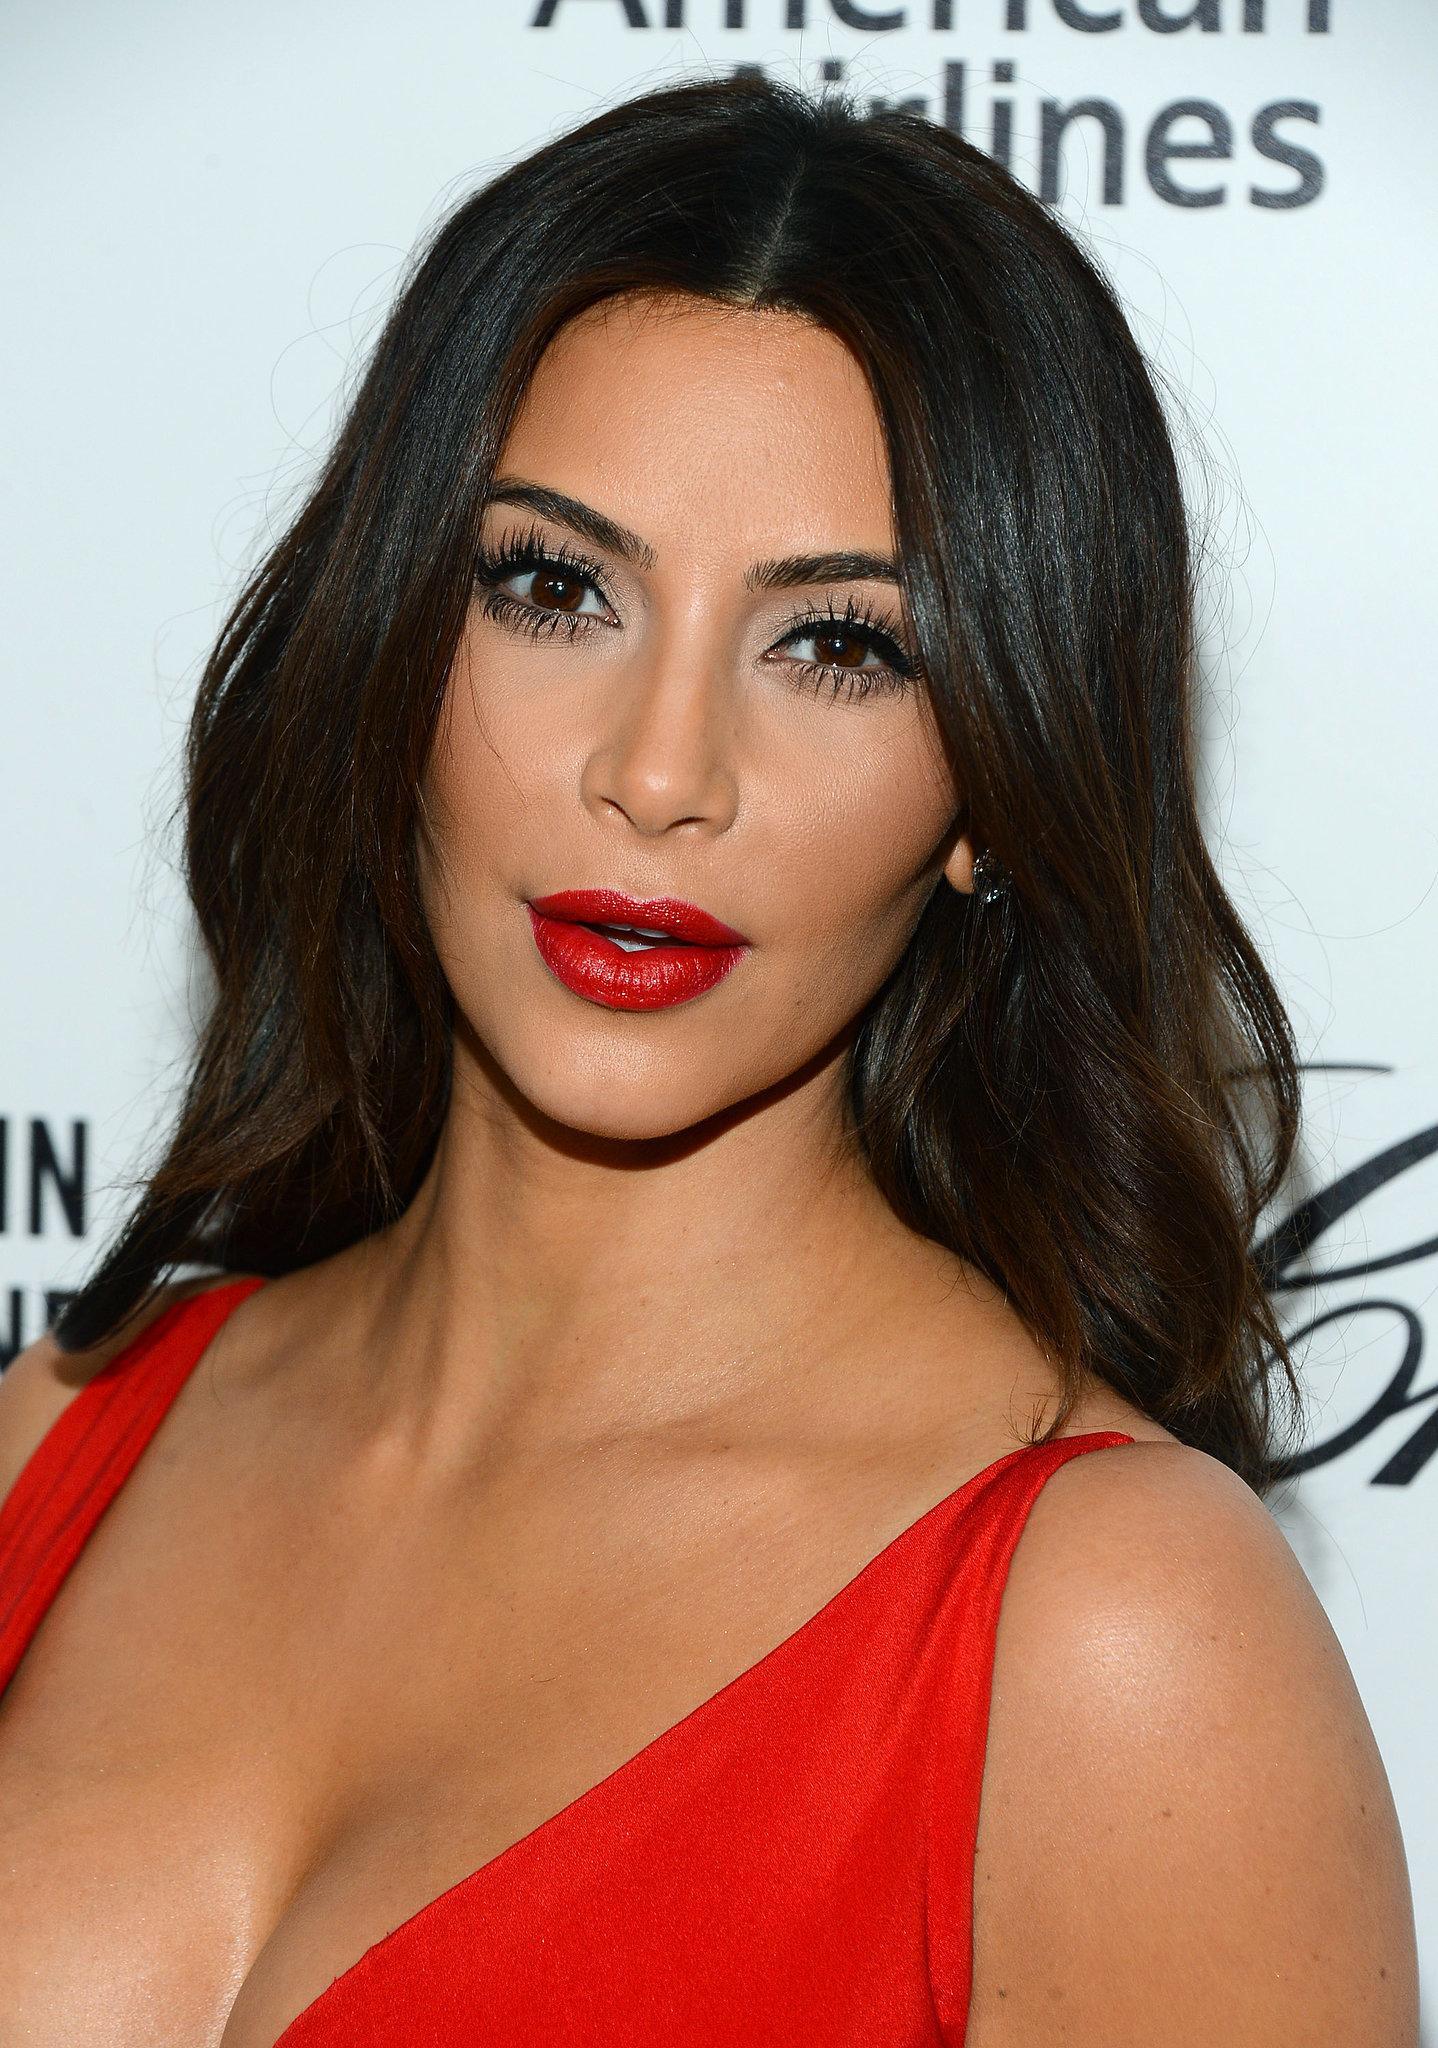 Kim Kardashian at Elton John Party